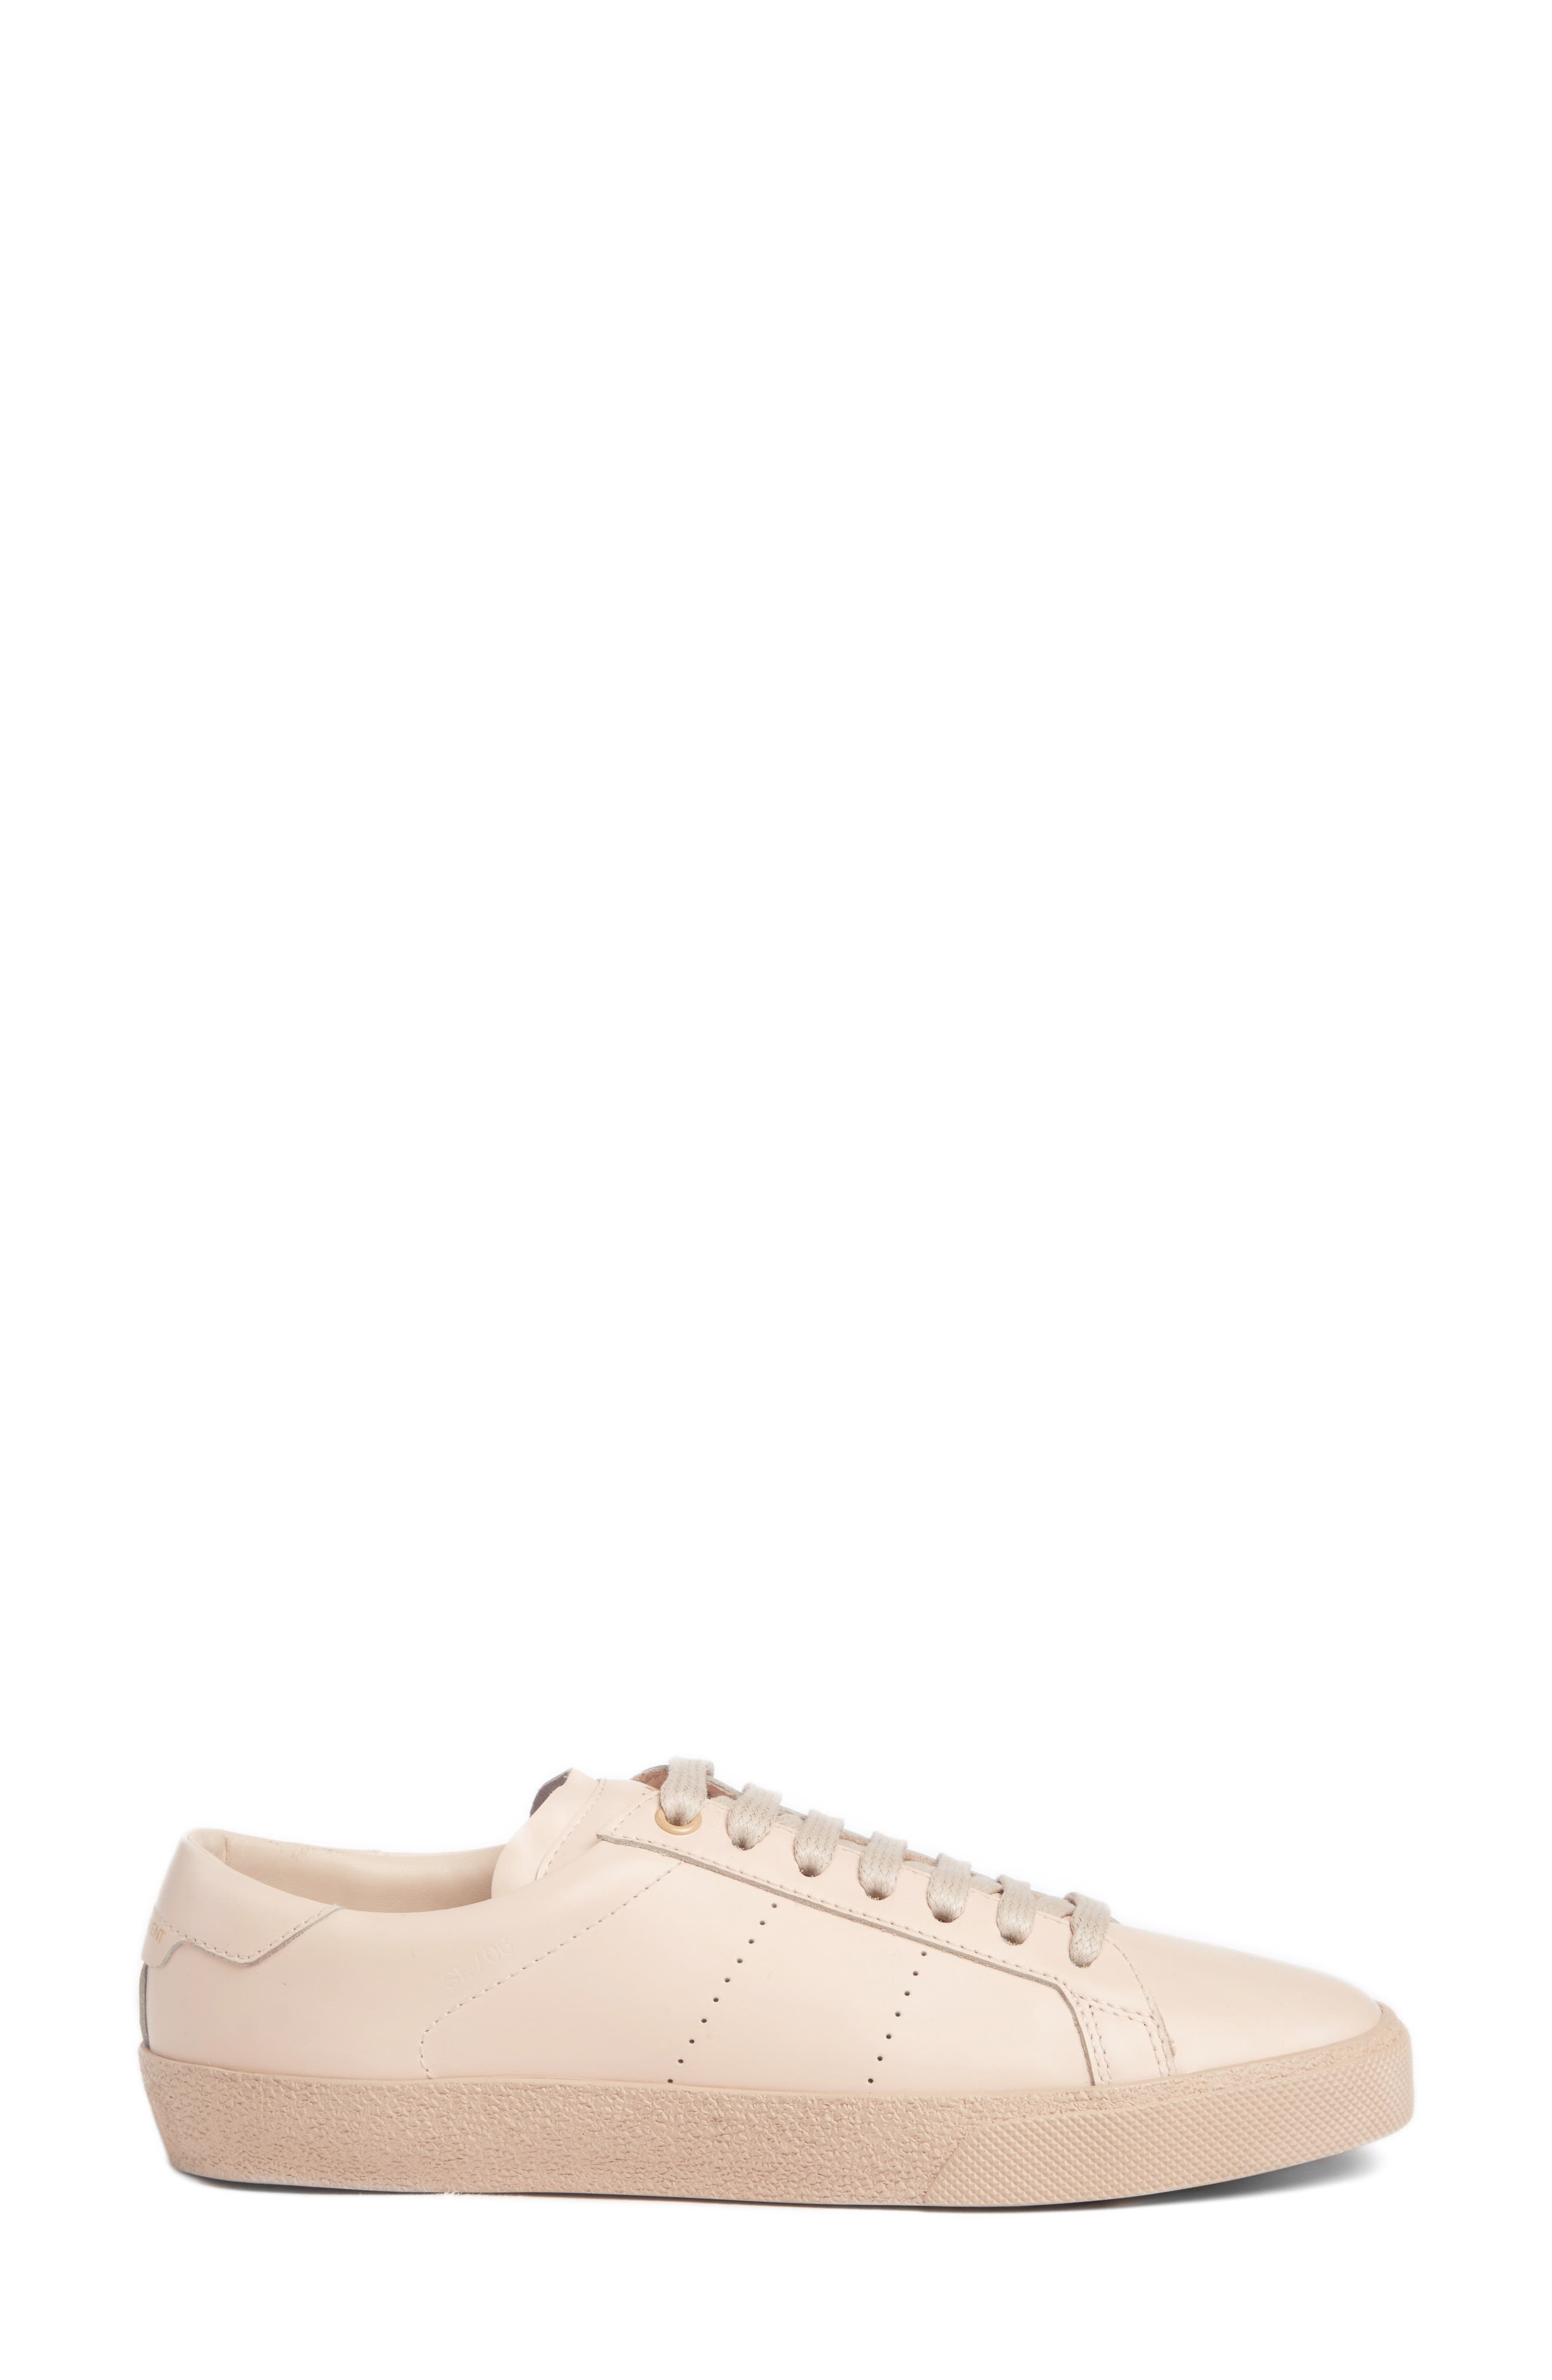 Court Classic Sneaker,                             Alternate thumbnail 3, color,                             650